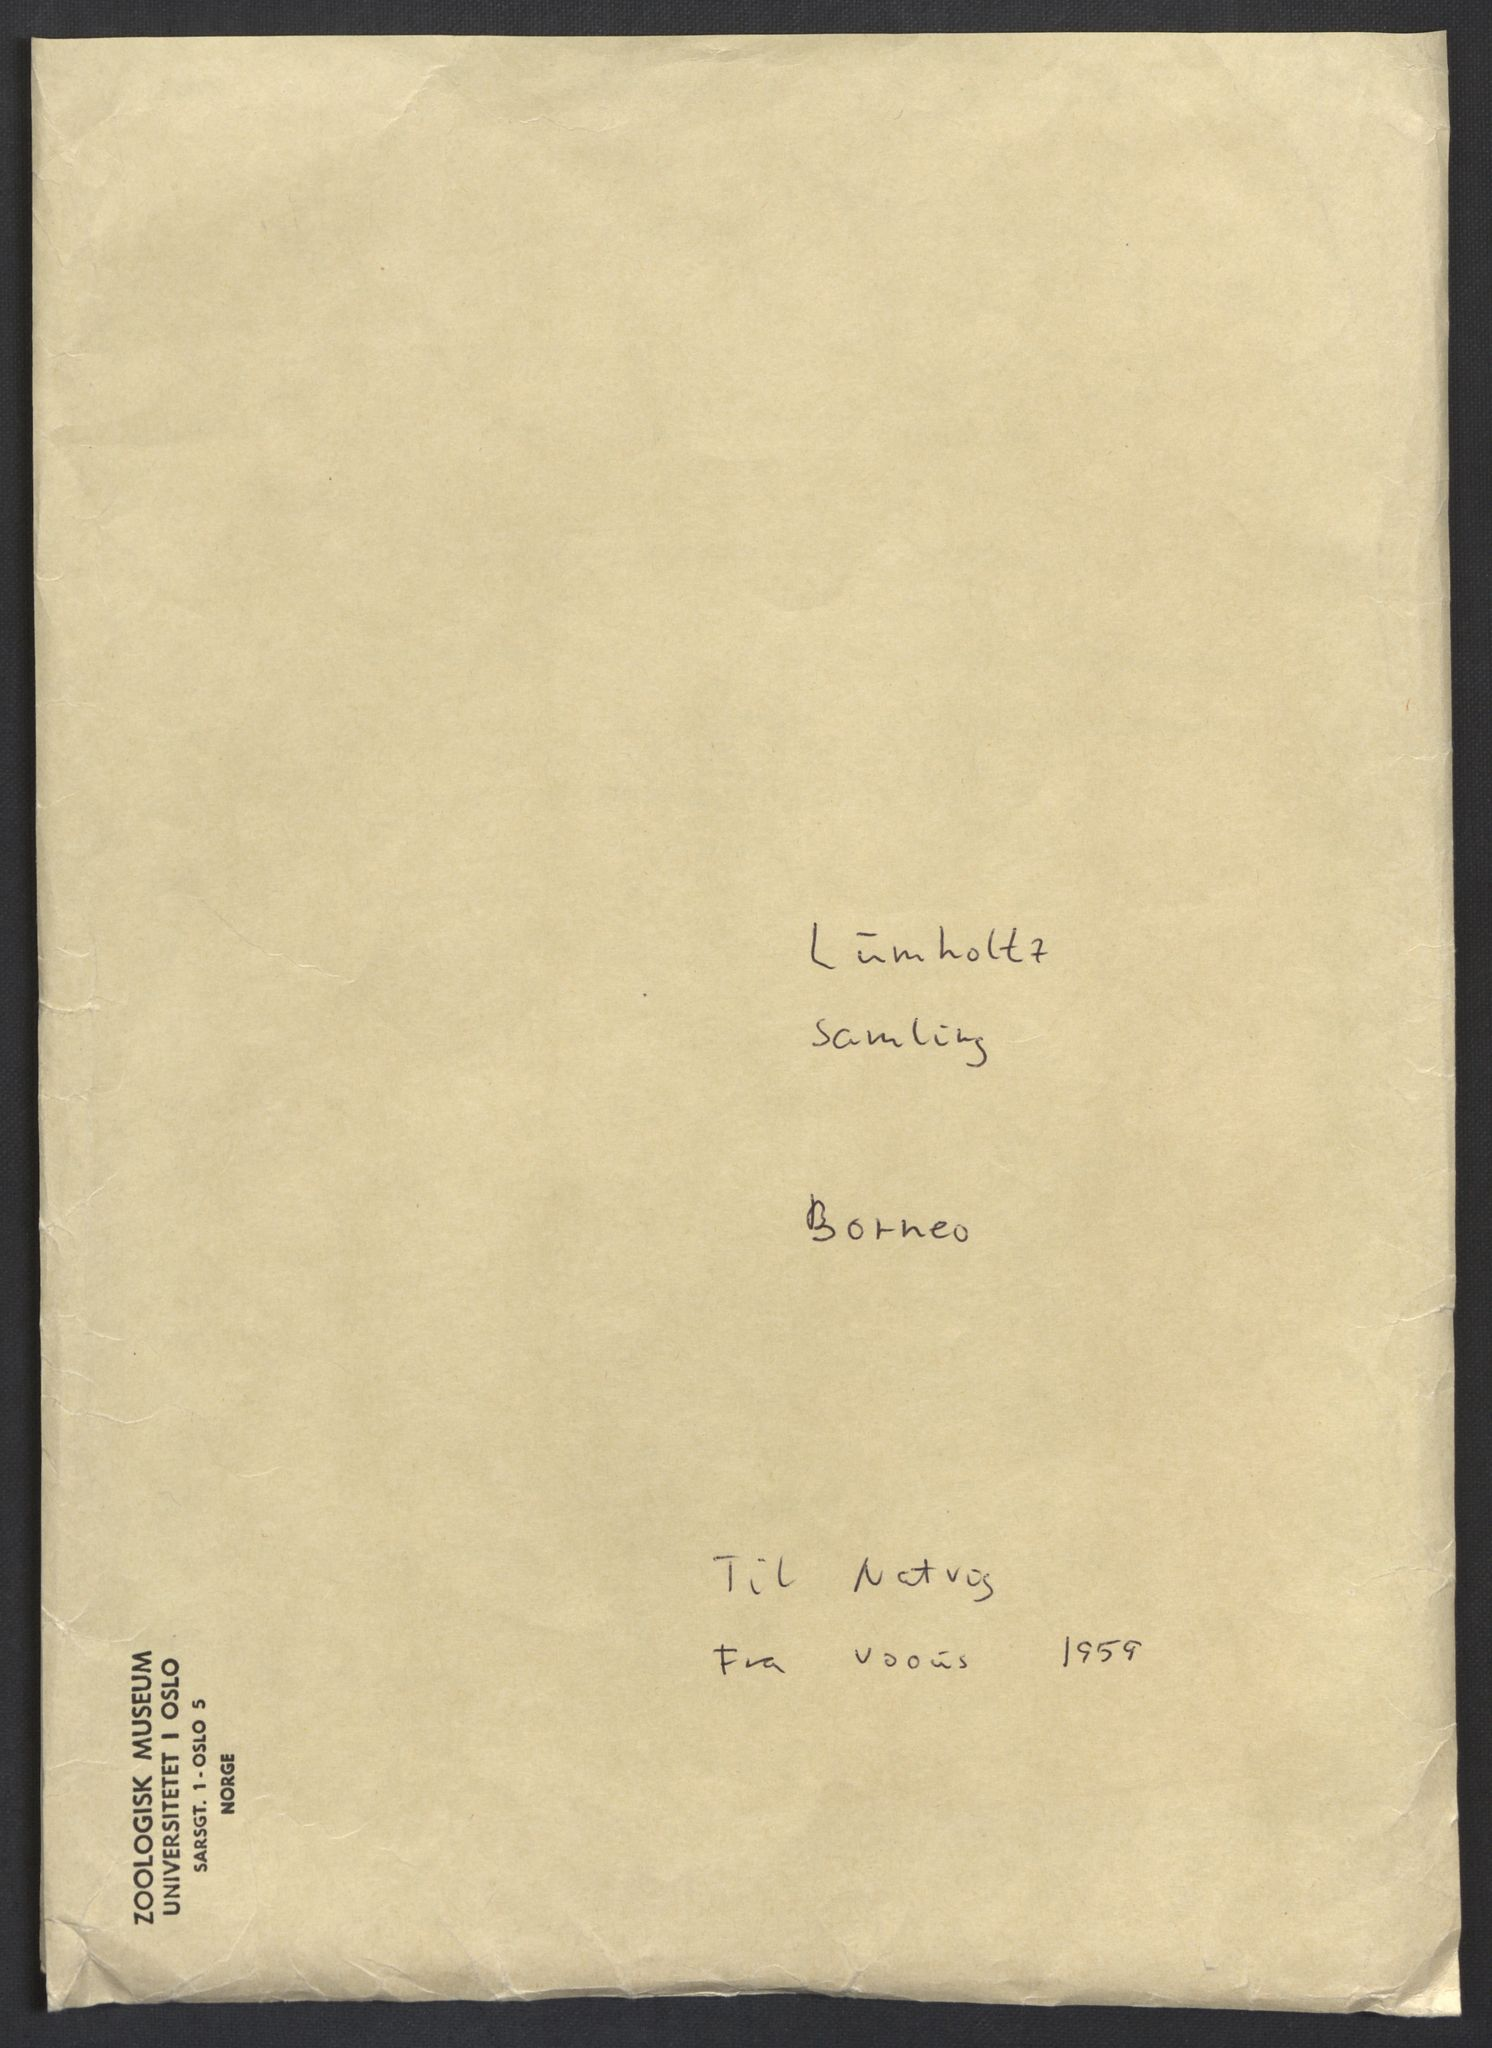 NHMO, Naturhistorisk museum (Oslo), 2: Fugl. Brev, Notater, Objektlister. Lumholtz samling, Borneo., 1951-1961